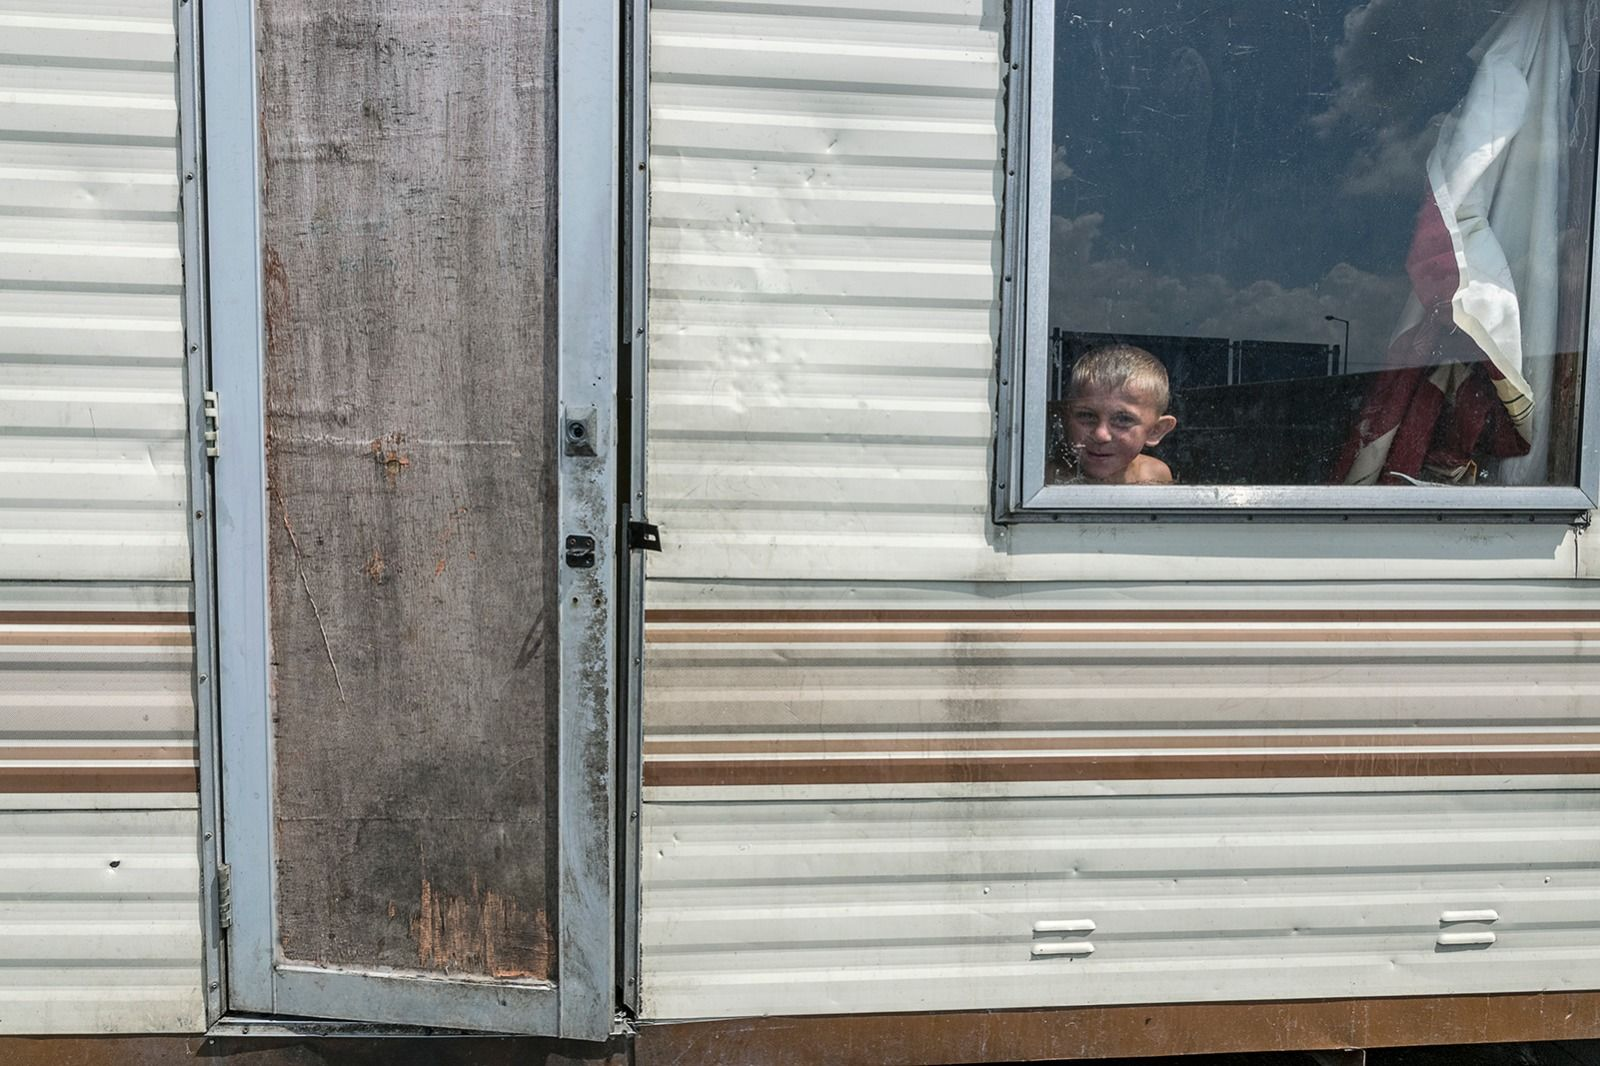 Boy in Window, Tipperary, Ireland 2018